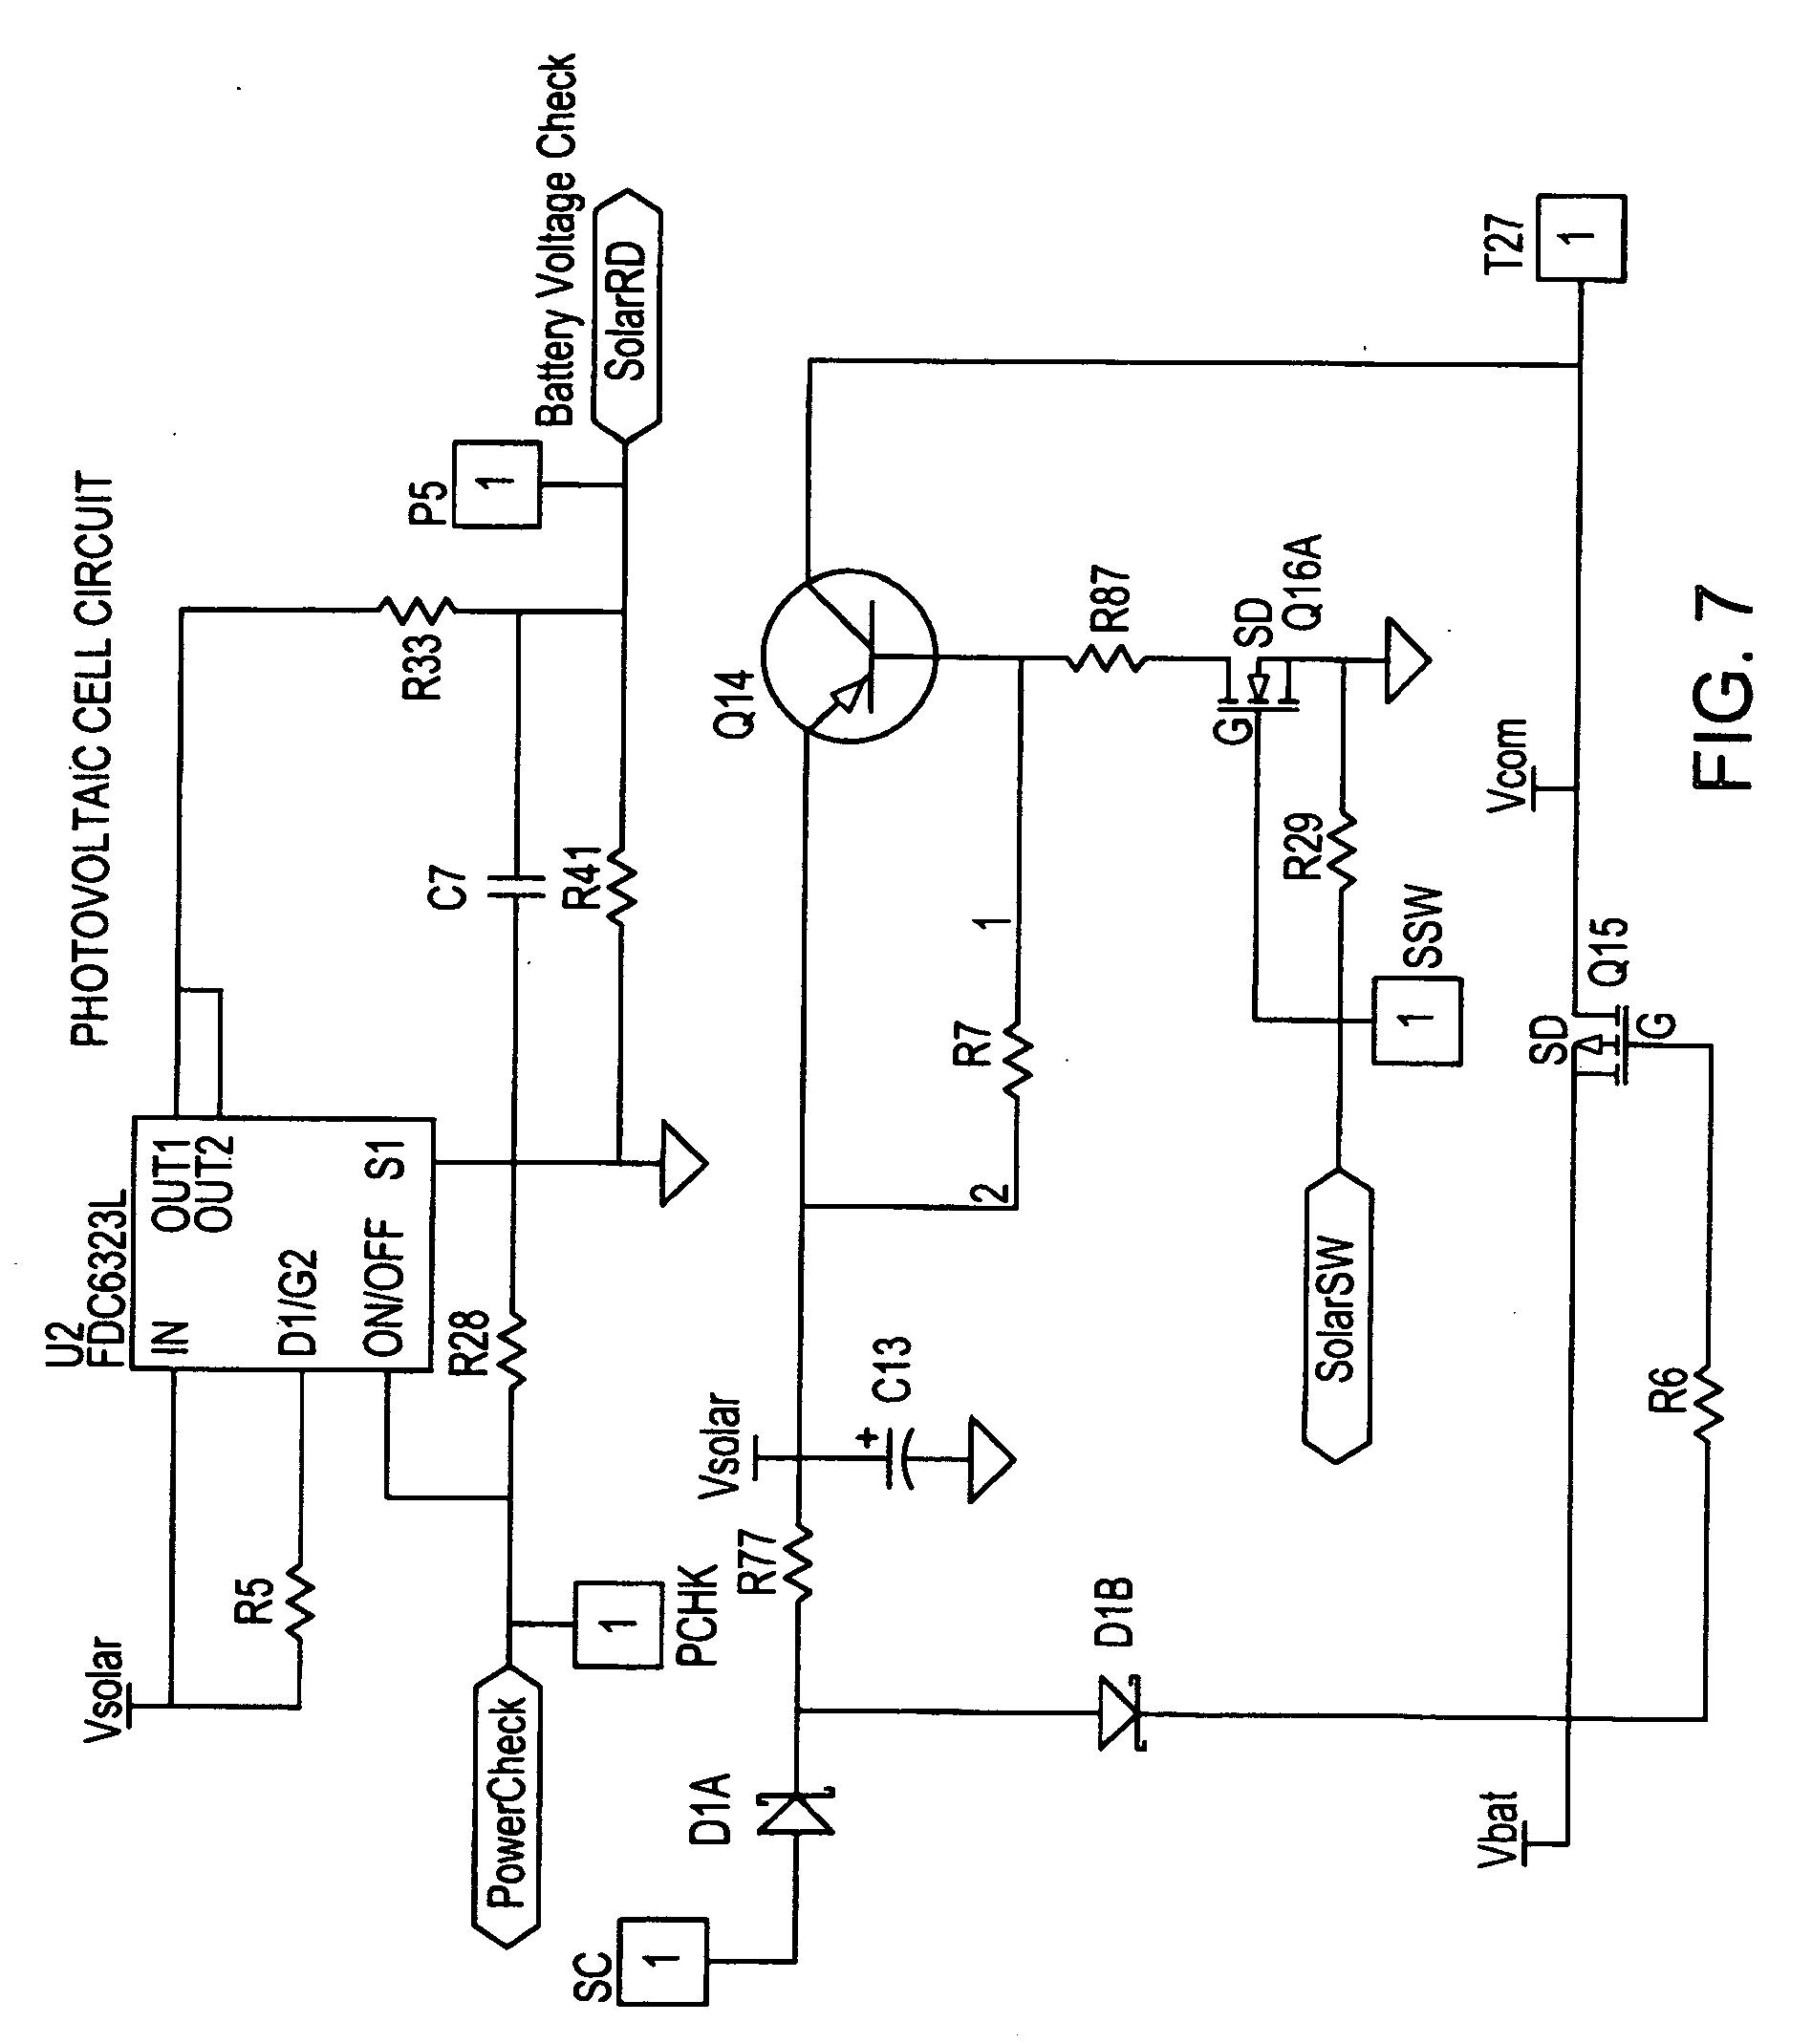 toilet schematic diagram clio 2 airbag wiring for sloan sensor diagrams garage door safety